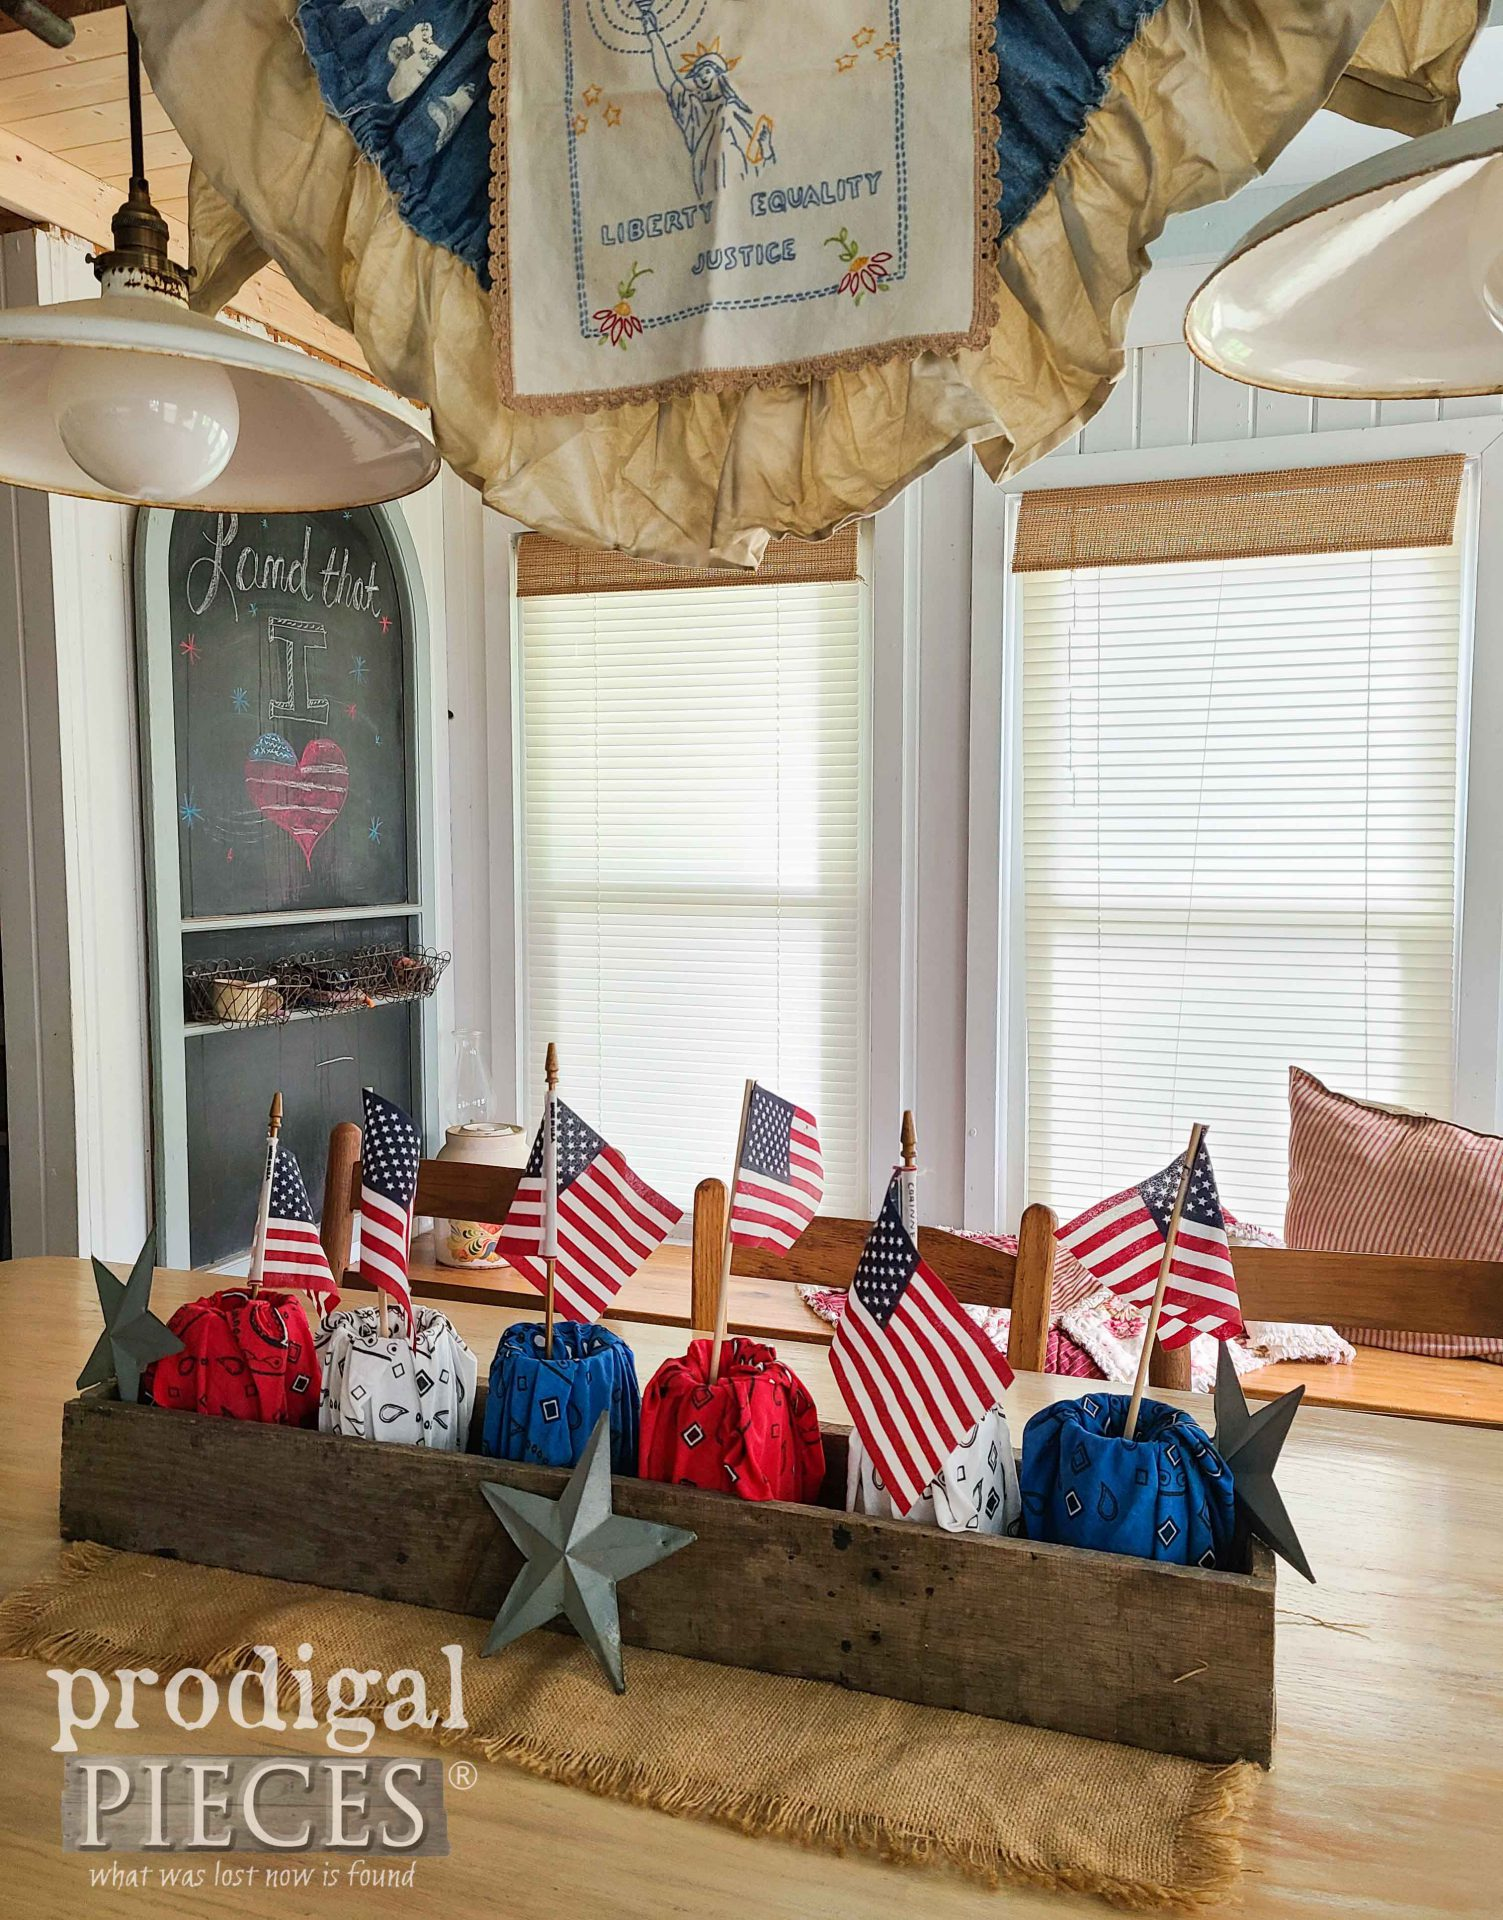 Refashioned Farmhouse Patriotic Bandanas in DIY Decor by Larissa of Prodigal Pieces | prodigalpieces.com #prodigalpieces #farmhouse #4thofjuly #diydecor #home